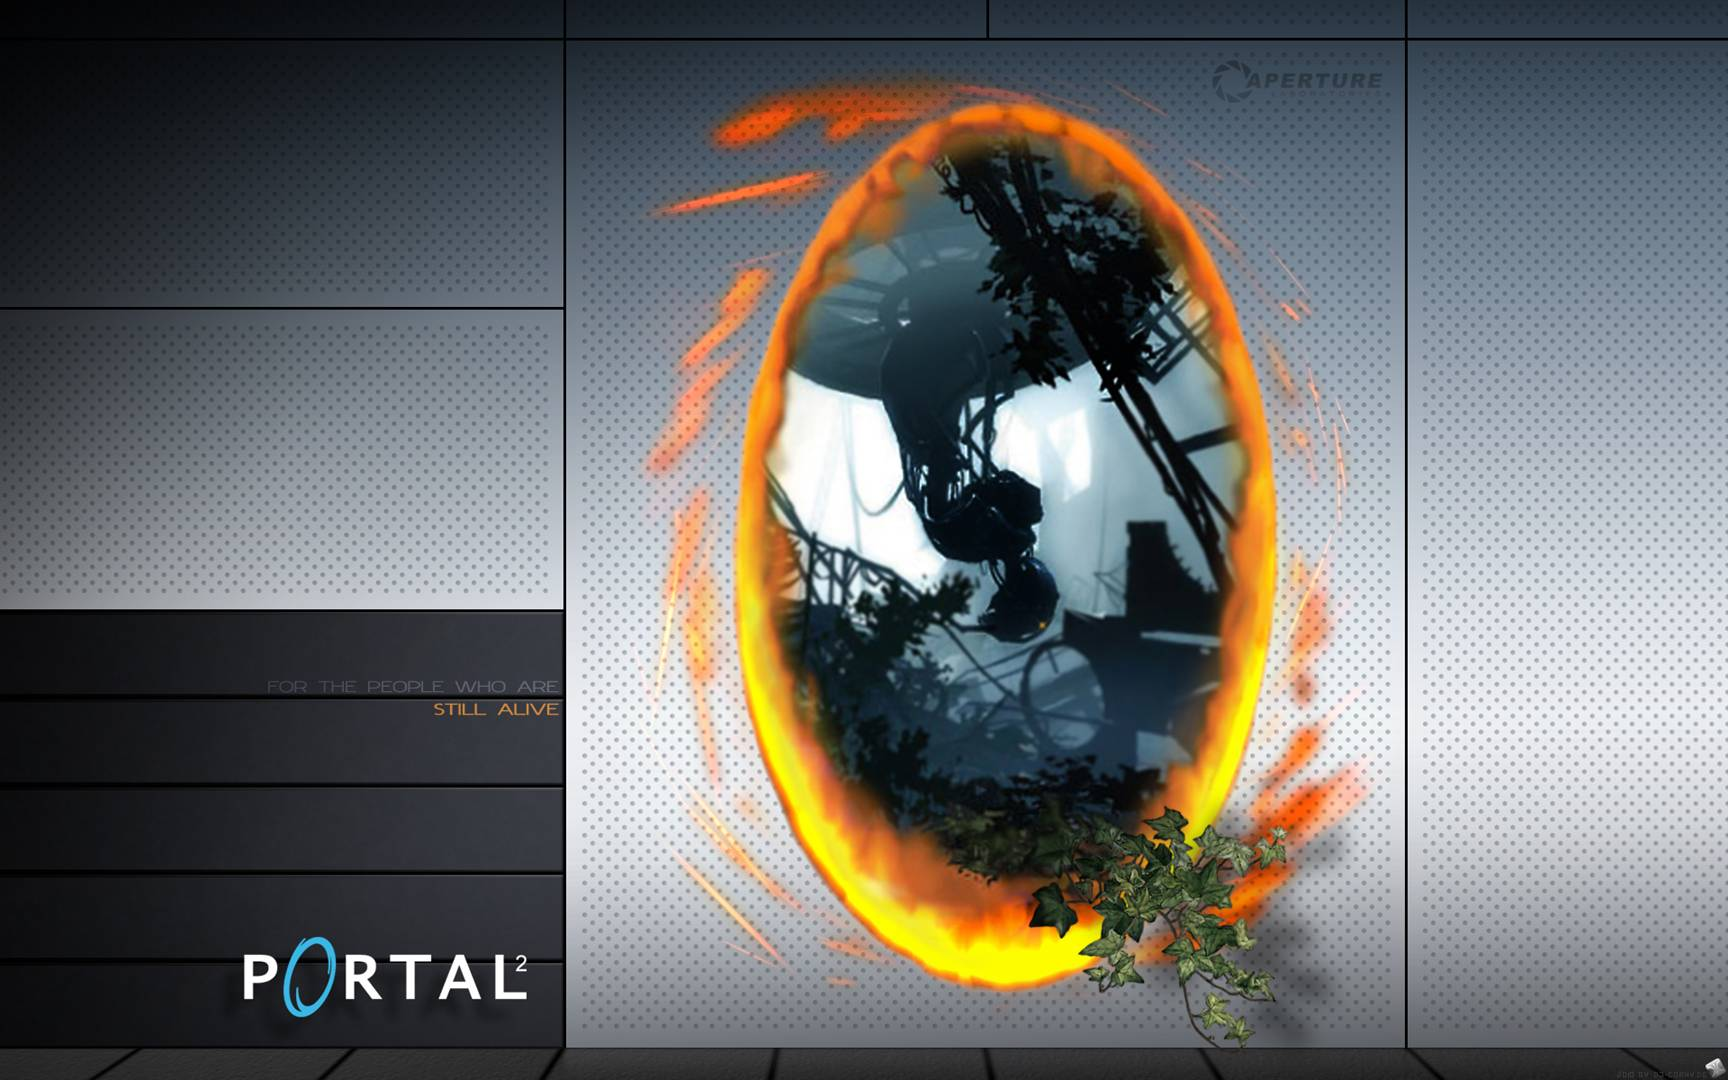 PORTAL 2 HD 1080P WALLPAPER PC GamingBoltcom Video Game News 1728x1080